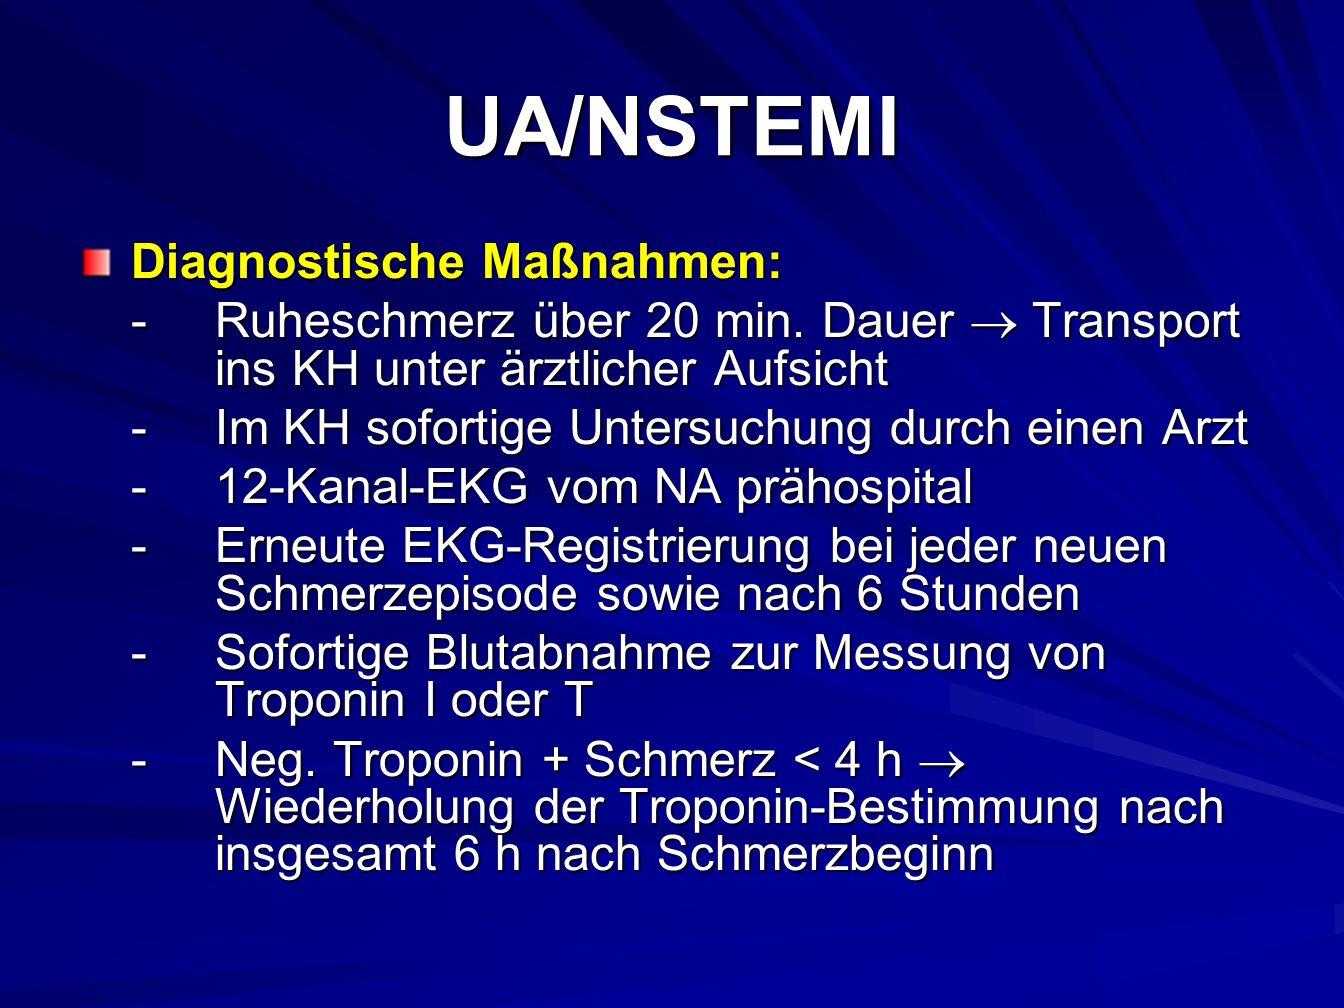 UA/NSTEMI Diagnostische Maßnahmen: